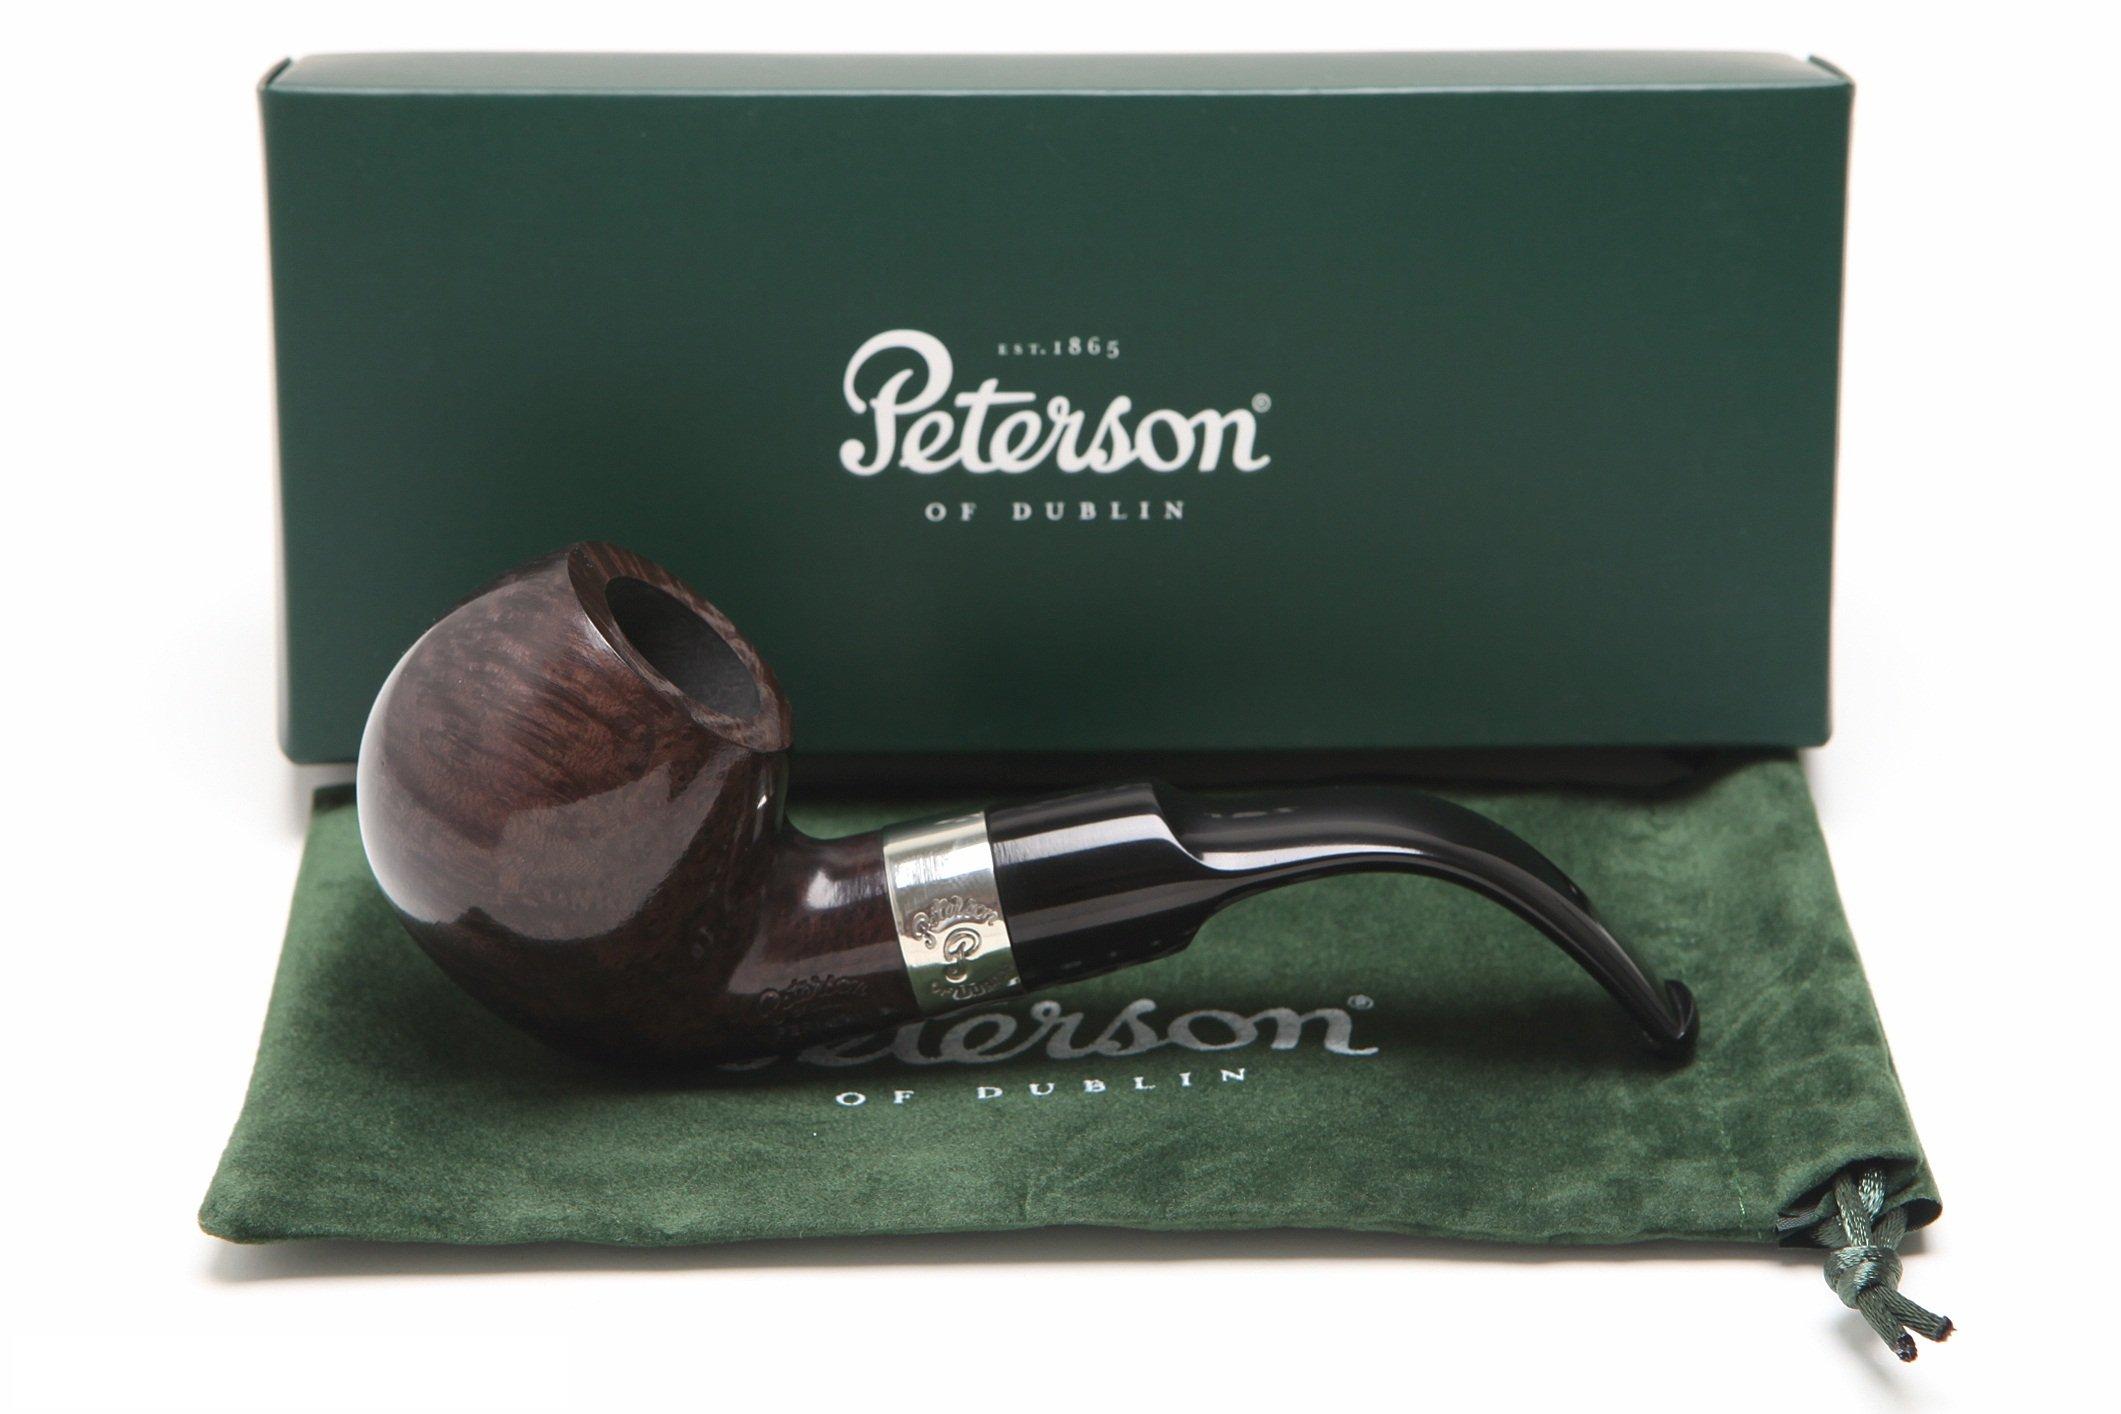 Peterson Fermoy XL 02 Tobacco Pipe Fishtail